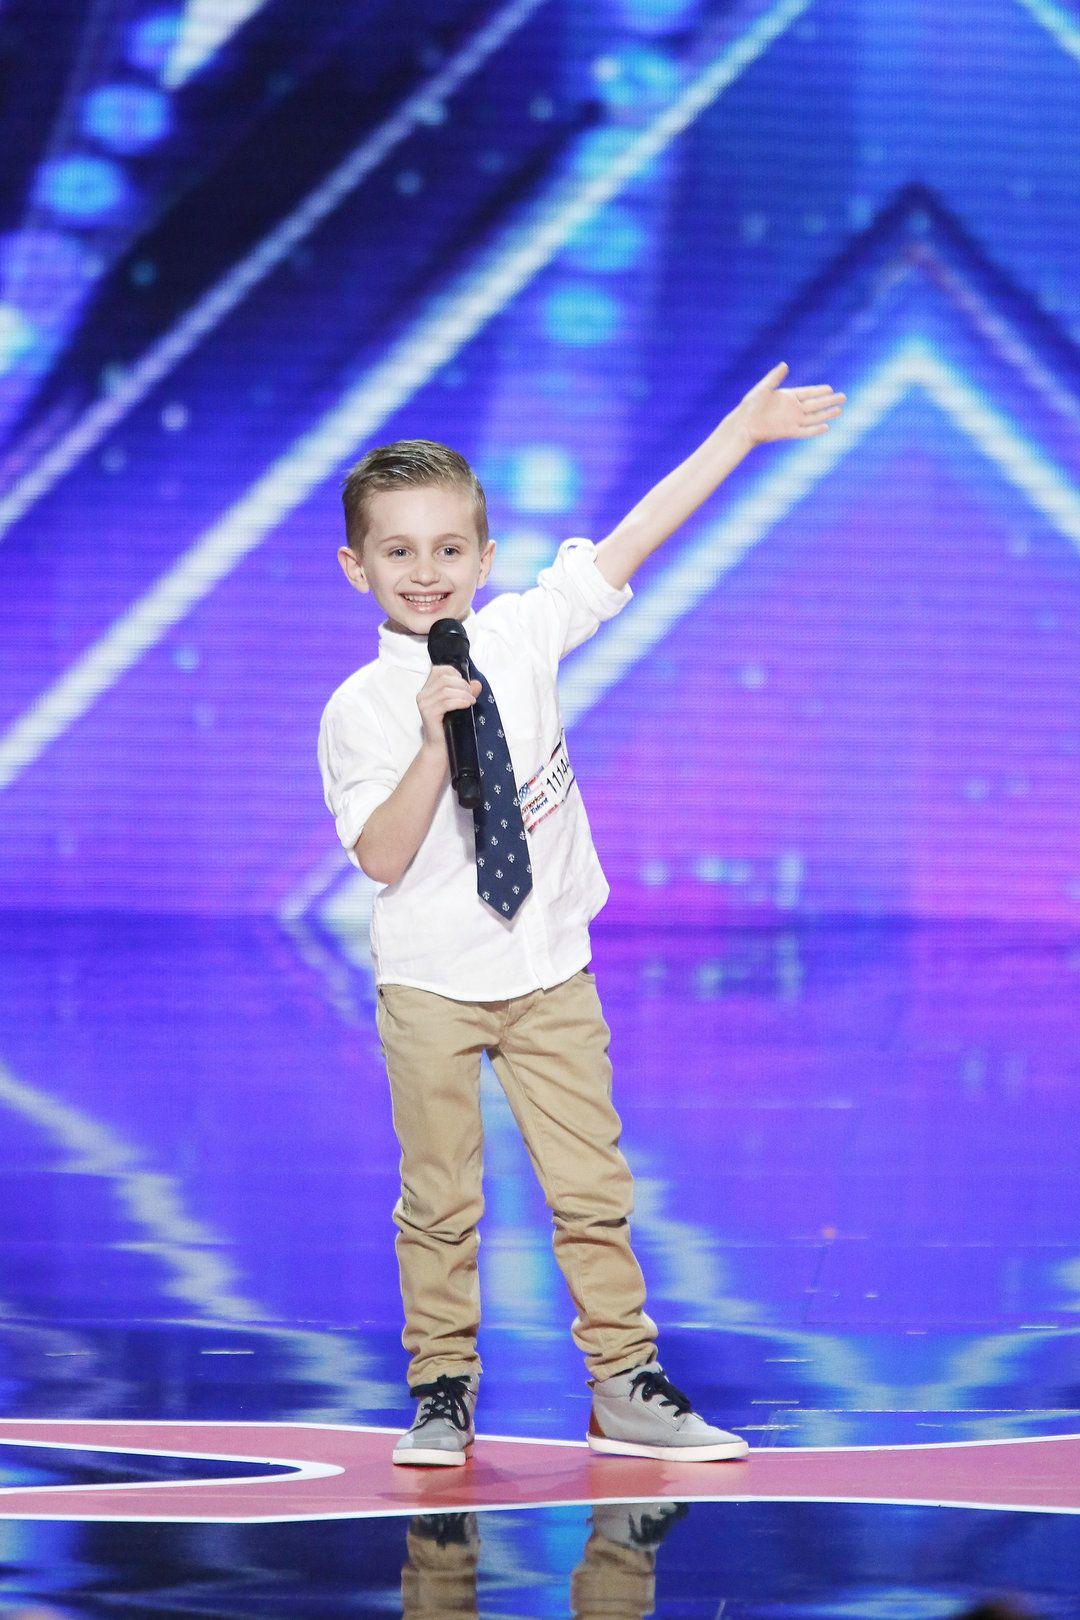 America's Got Talent Season 11 This 6yr old kid made me